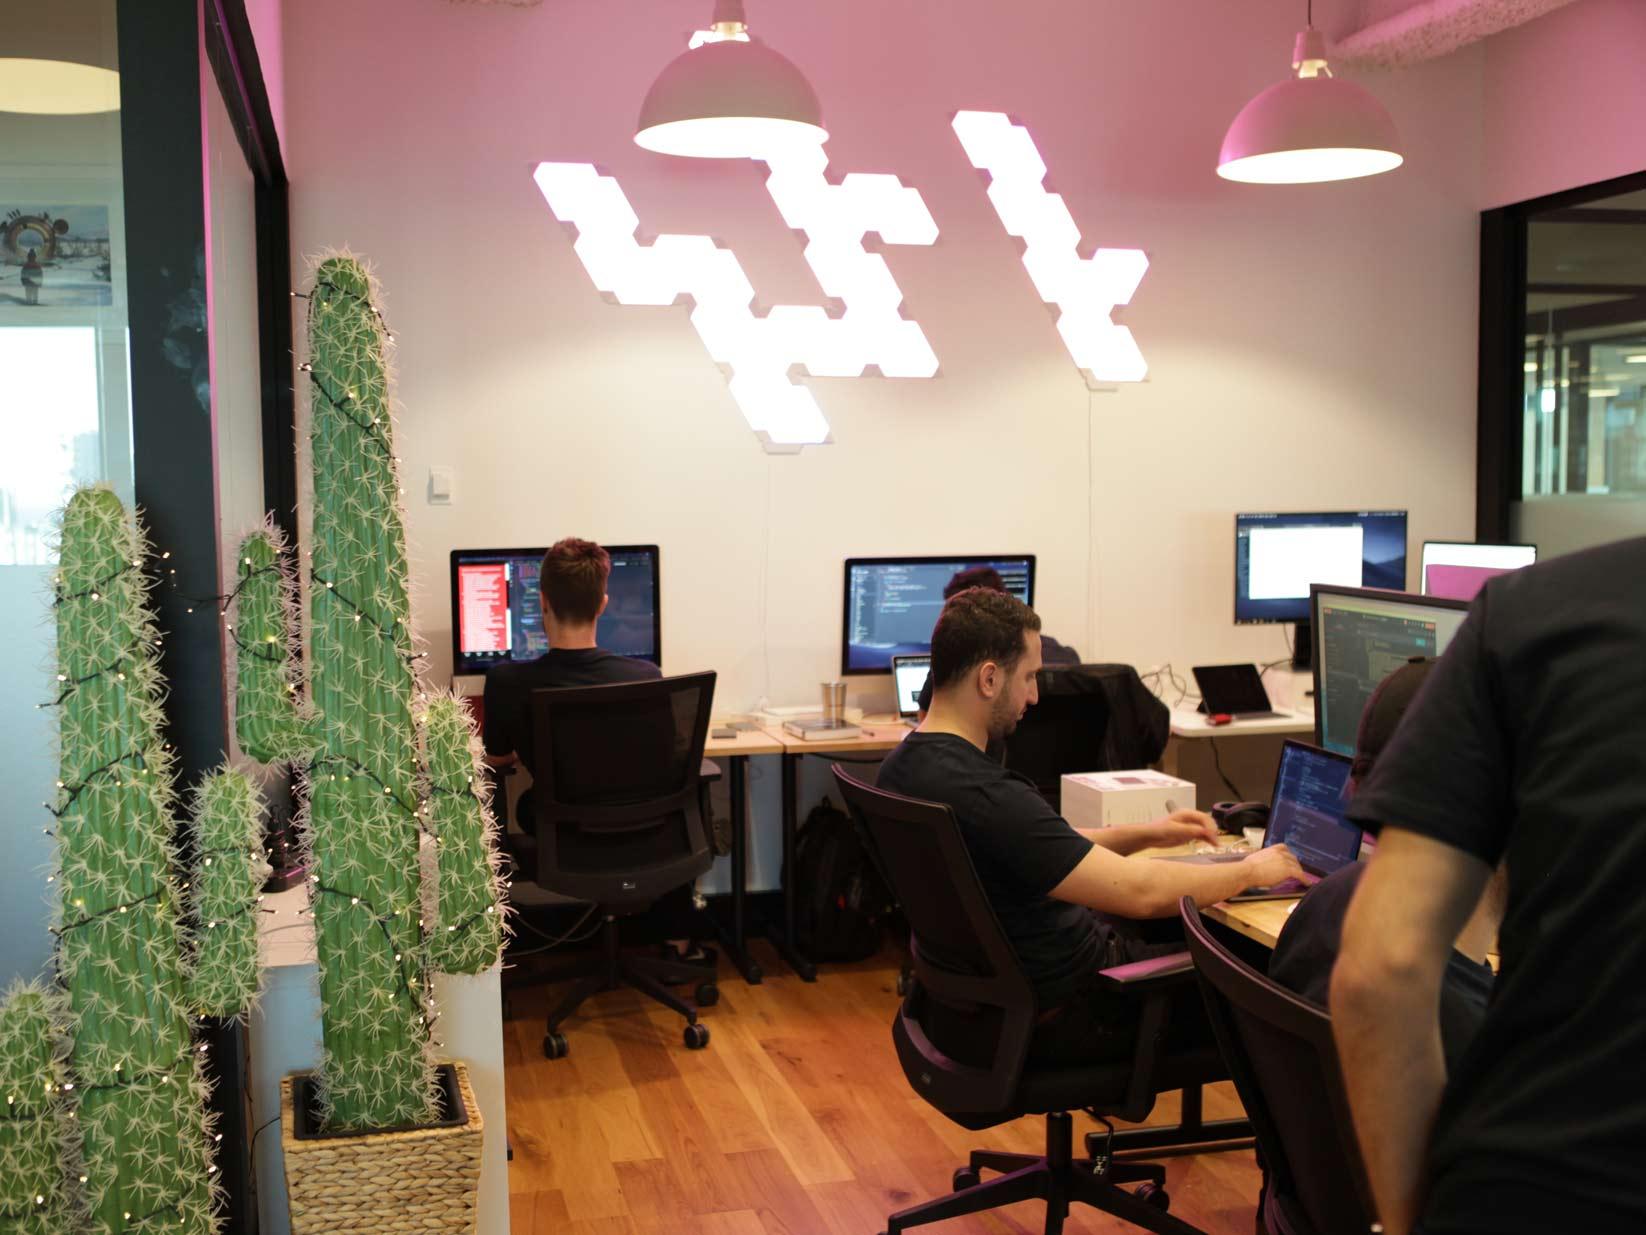 Web app development service Melbourne - DreamWalk